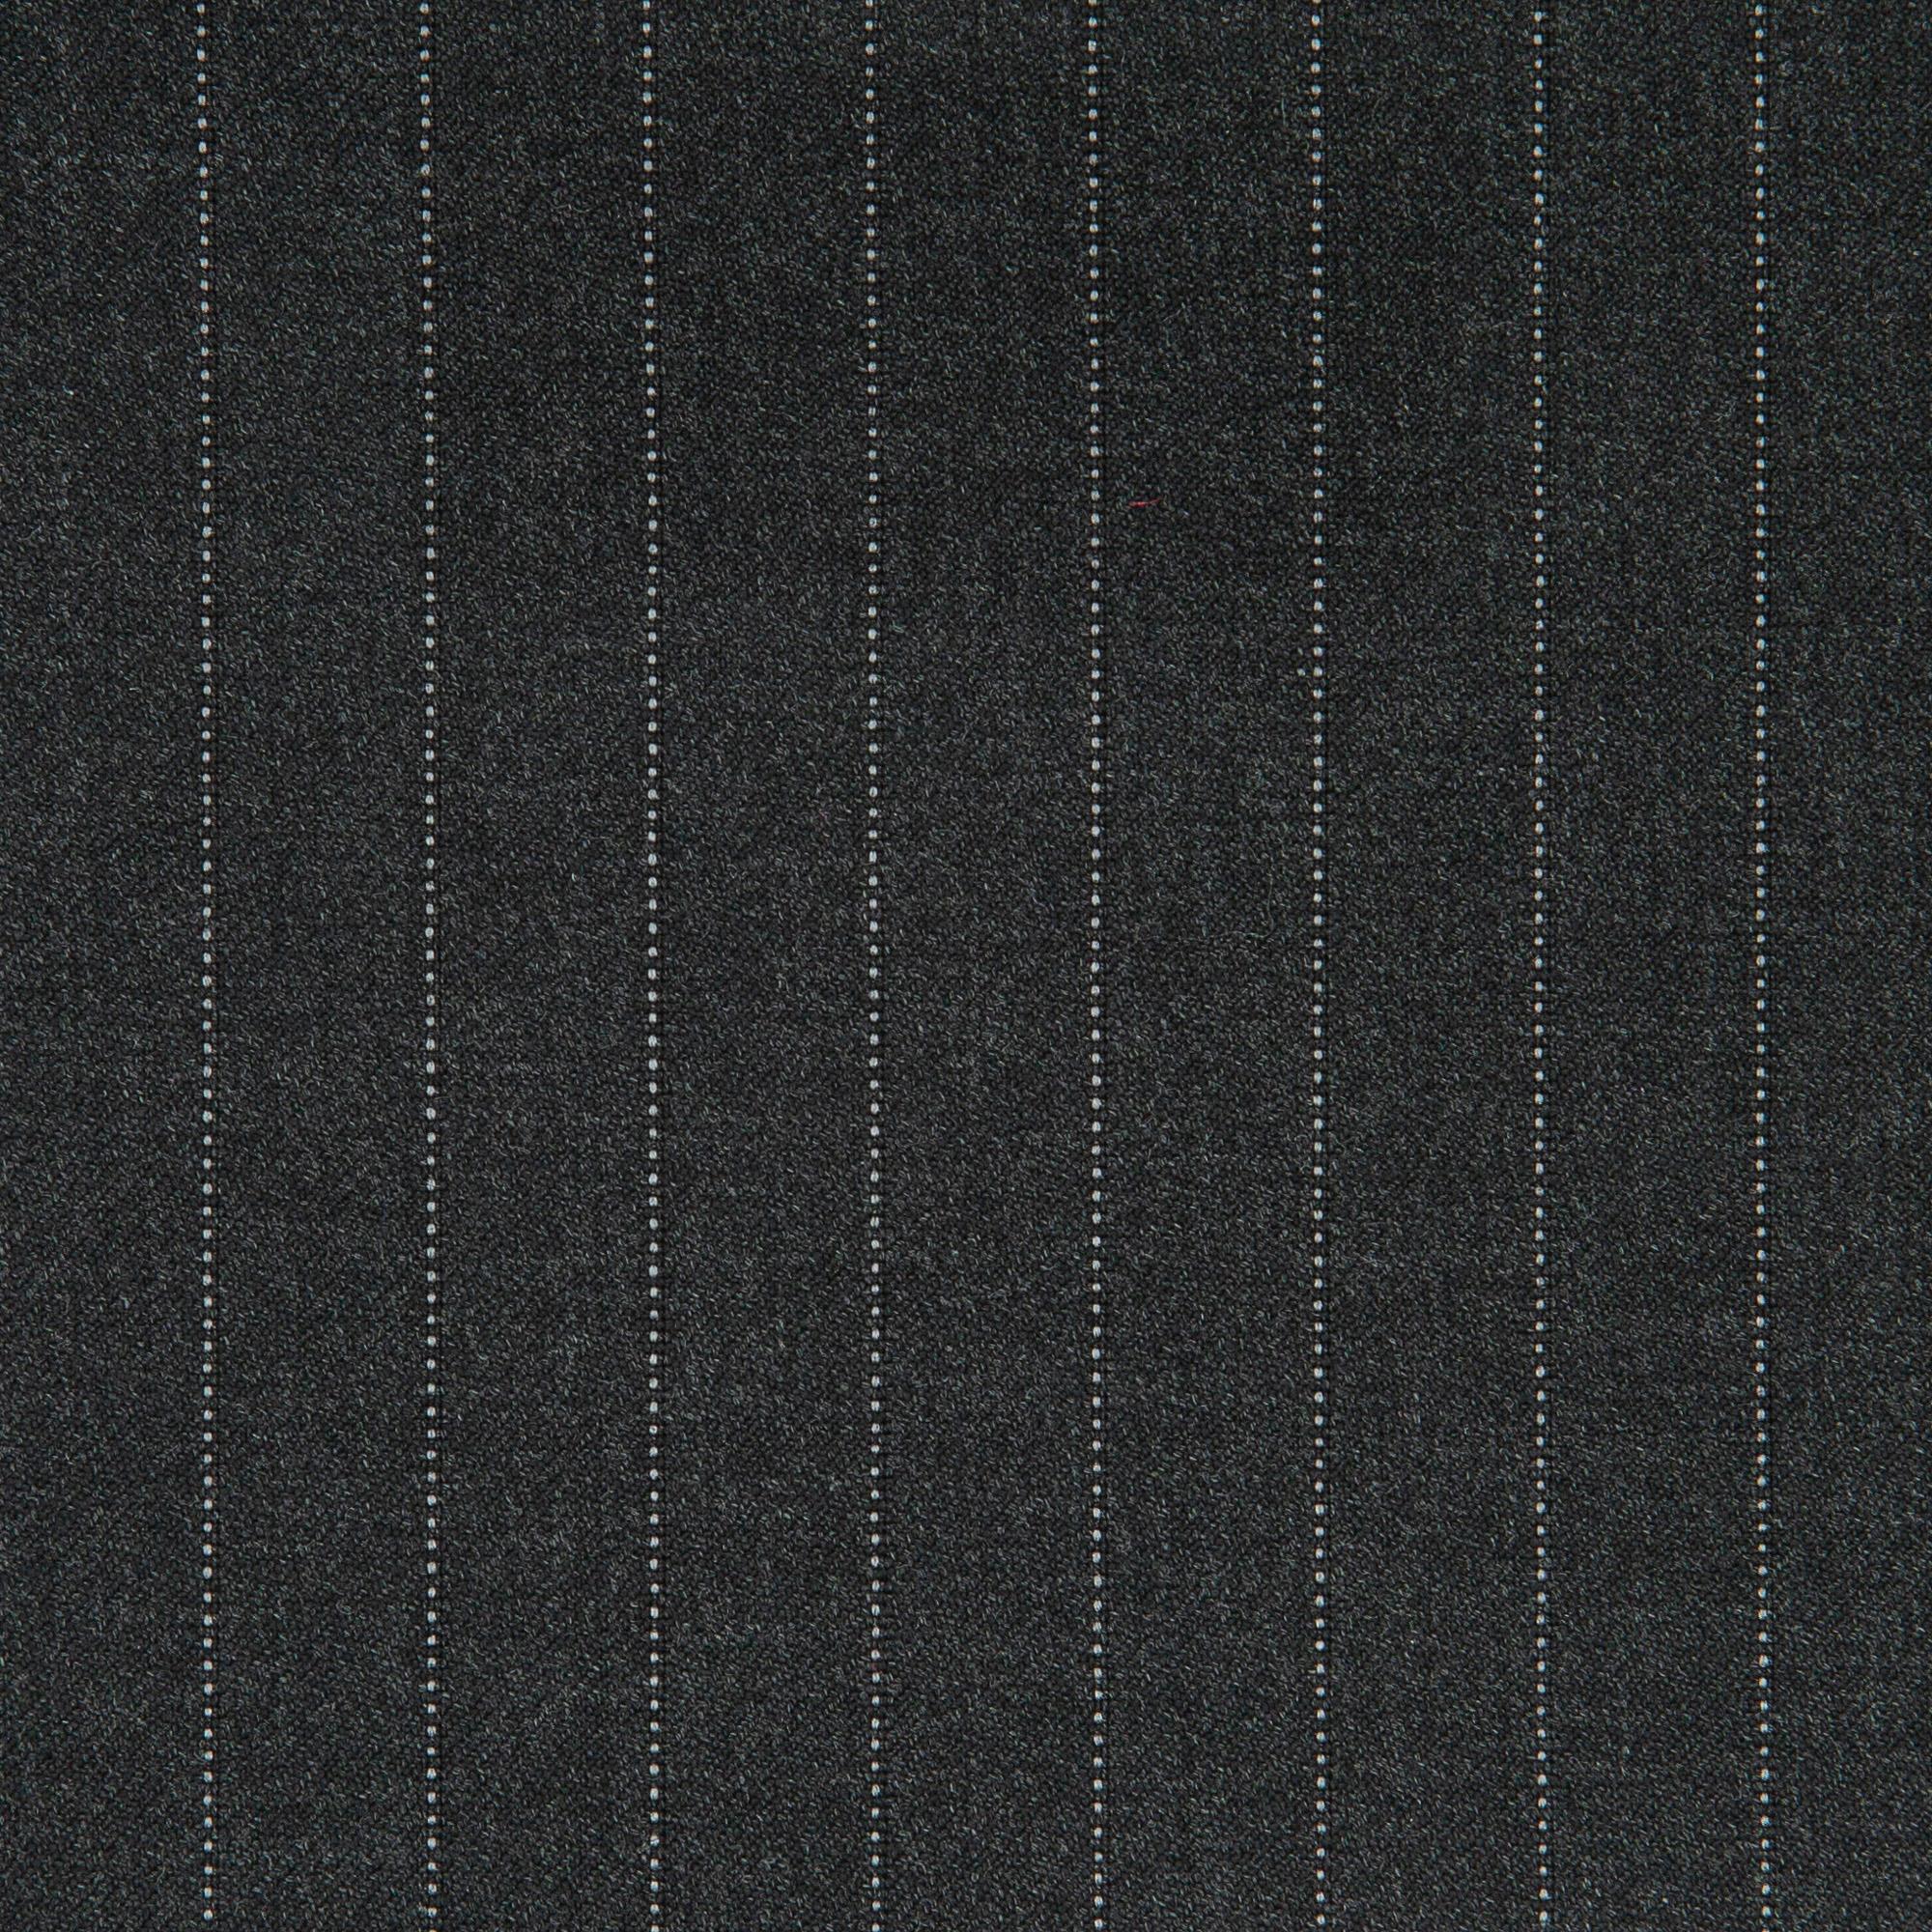 Sz032026 1